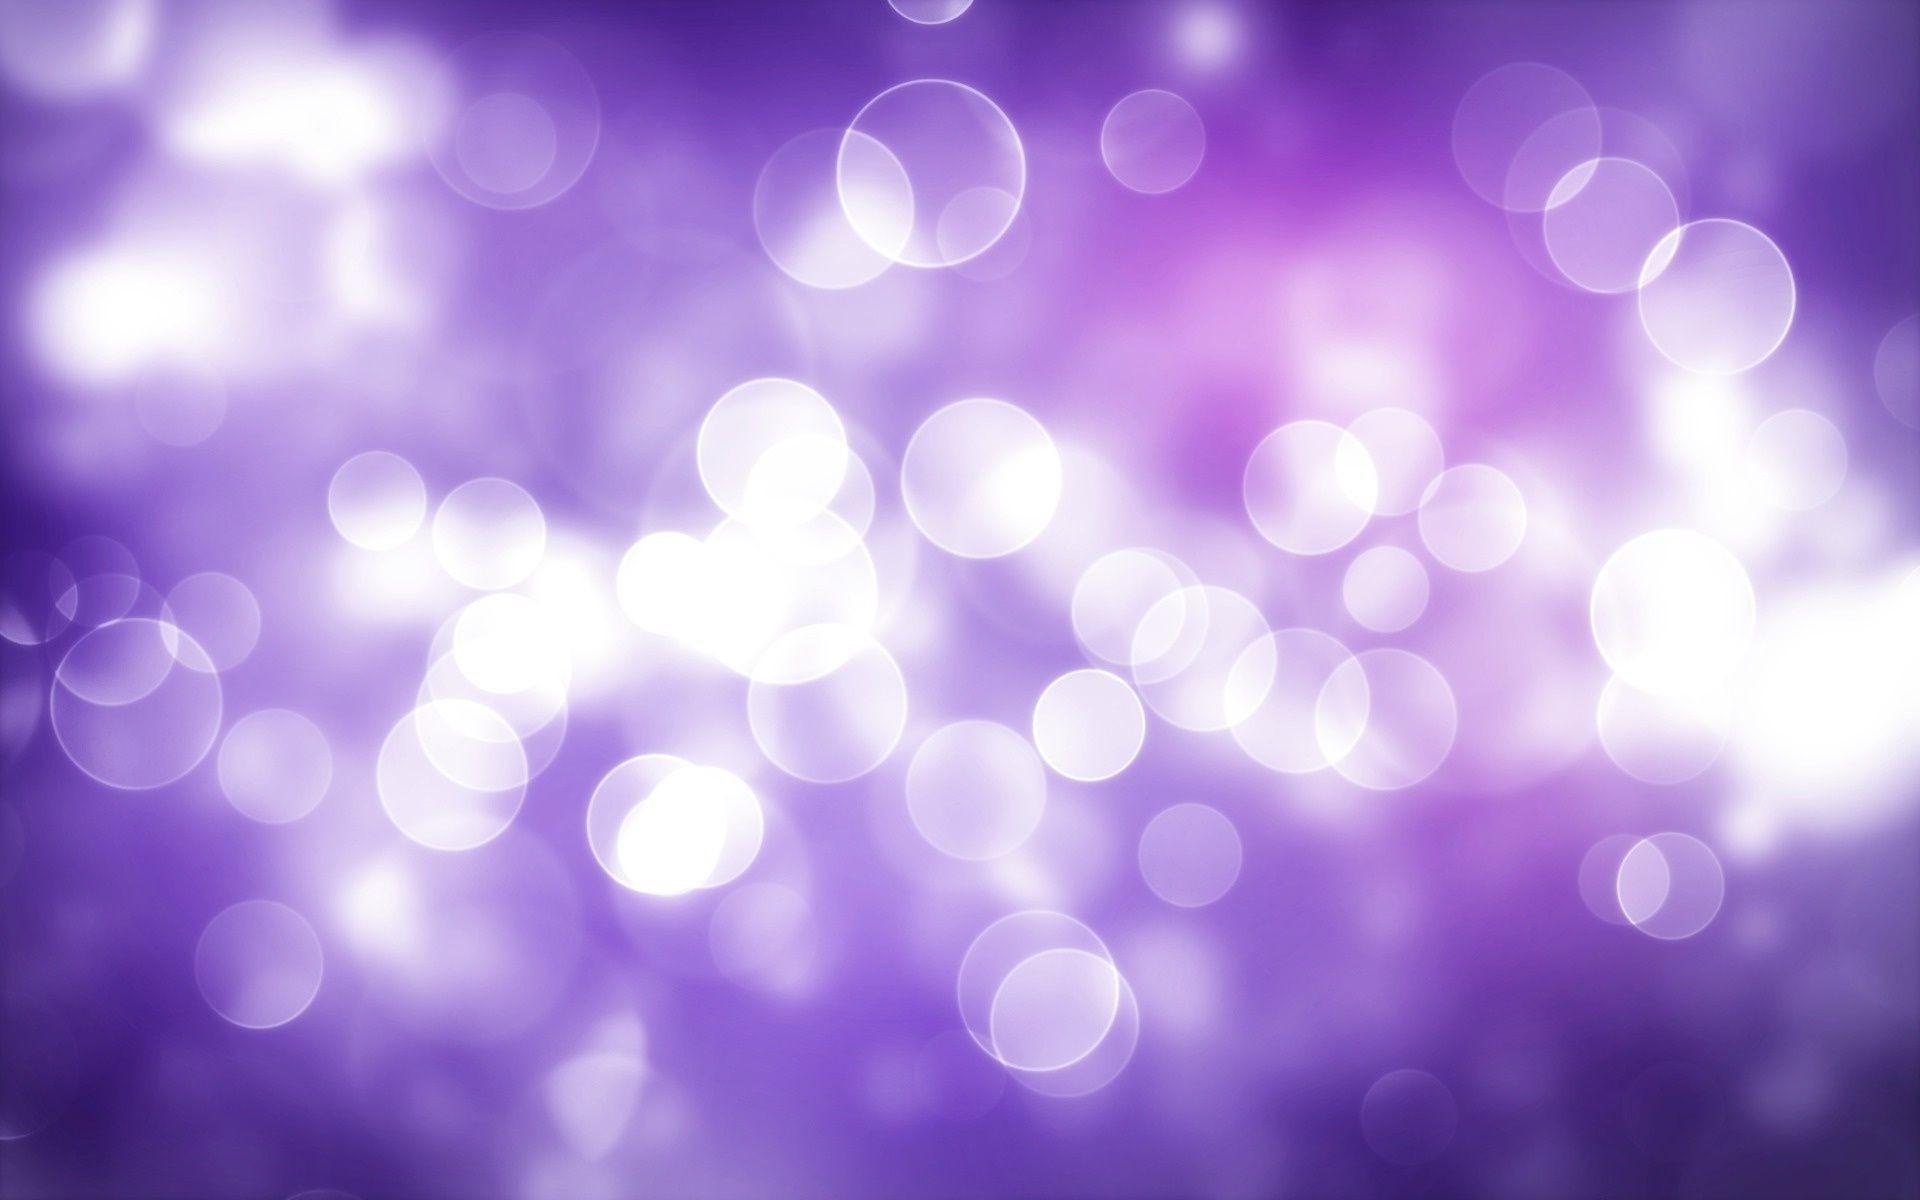 Purple And White Wallpaper